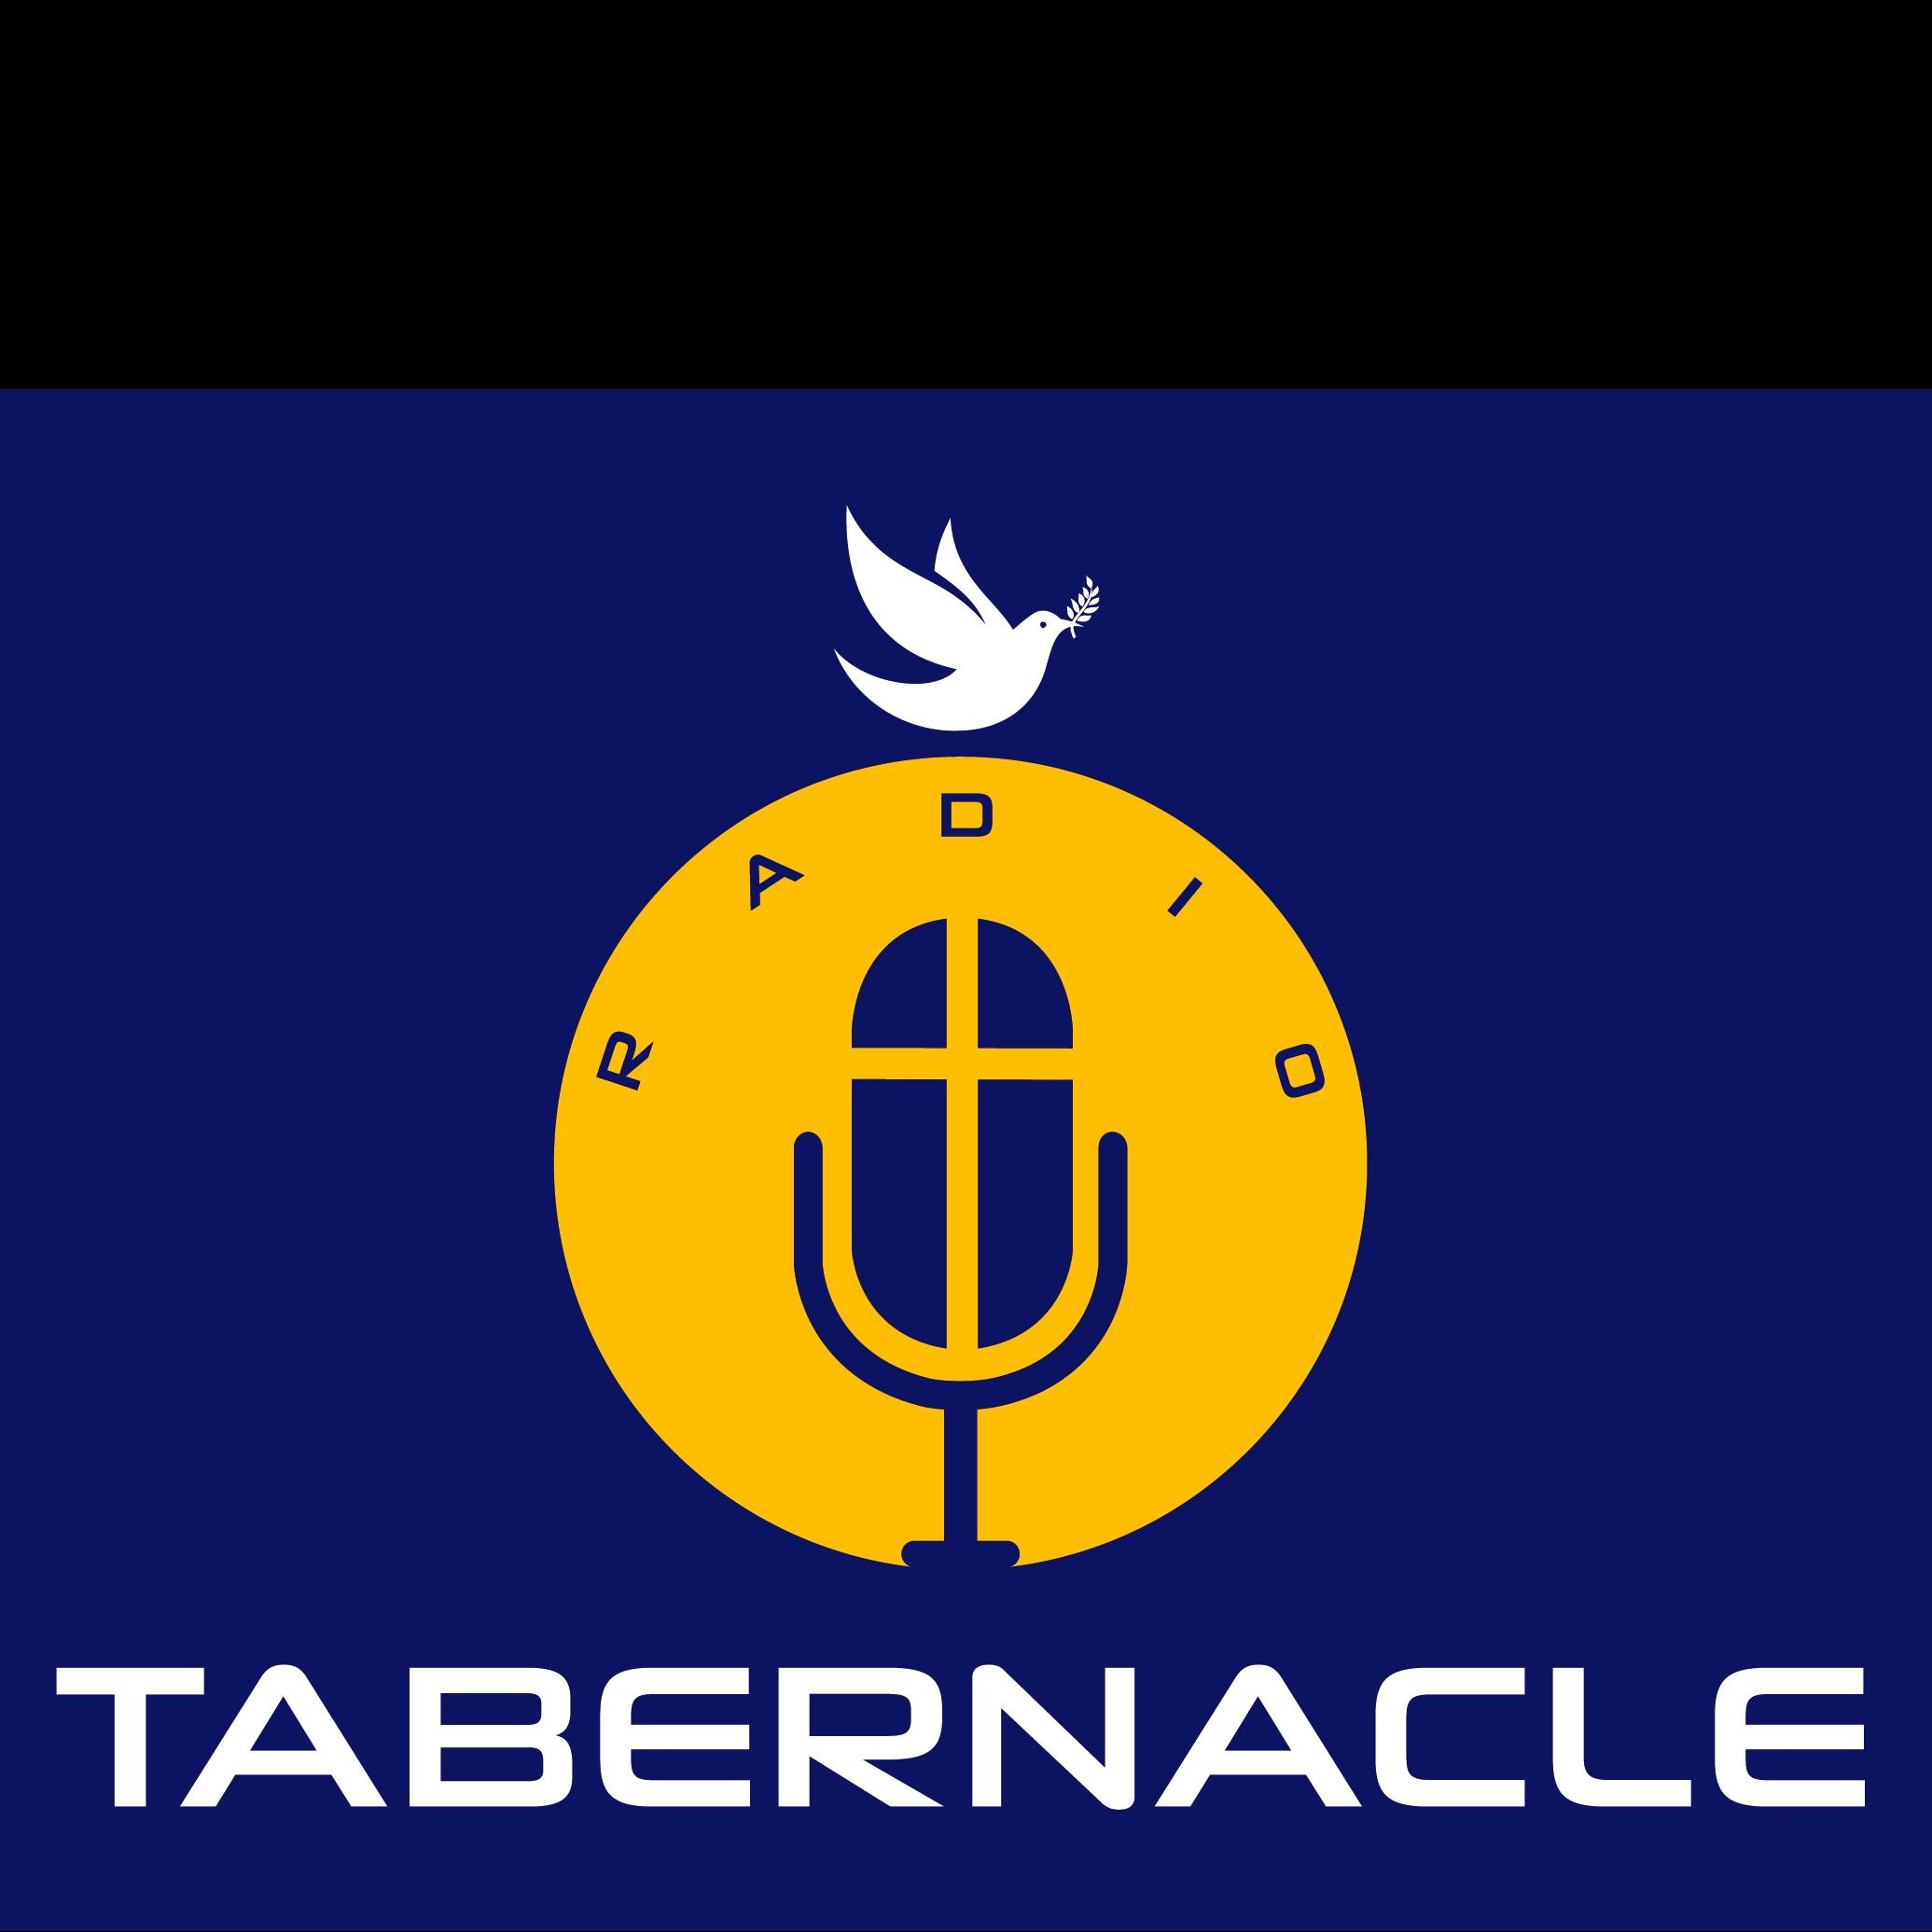 Radio Tele Tabernacle-Creole